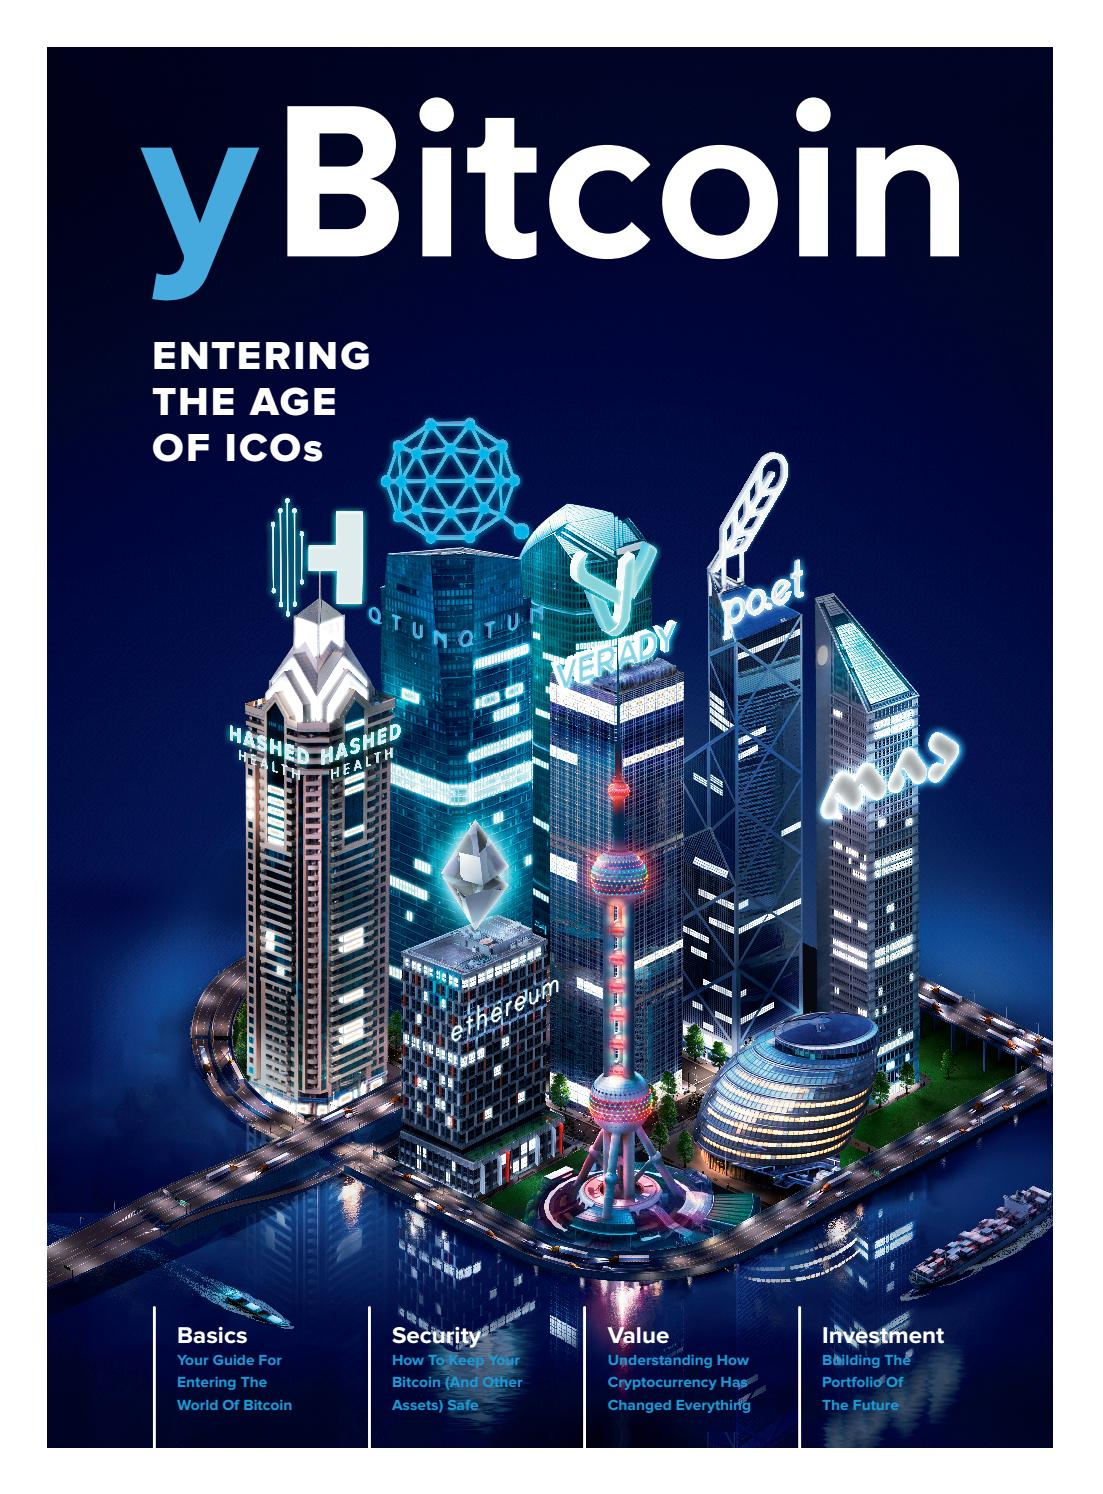 9b620ca44 Volume 4, Issue 1 by yBitcoin - issuu